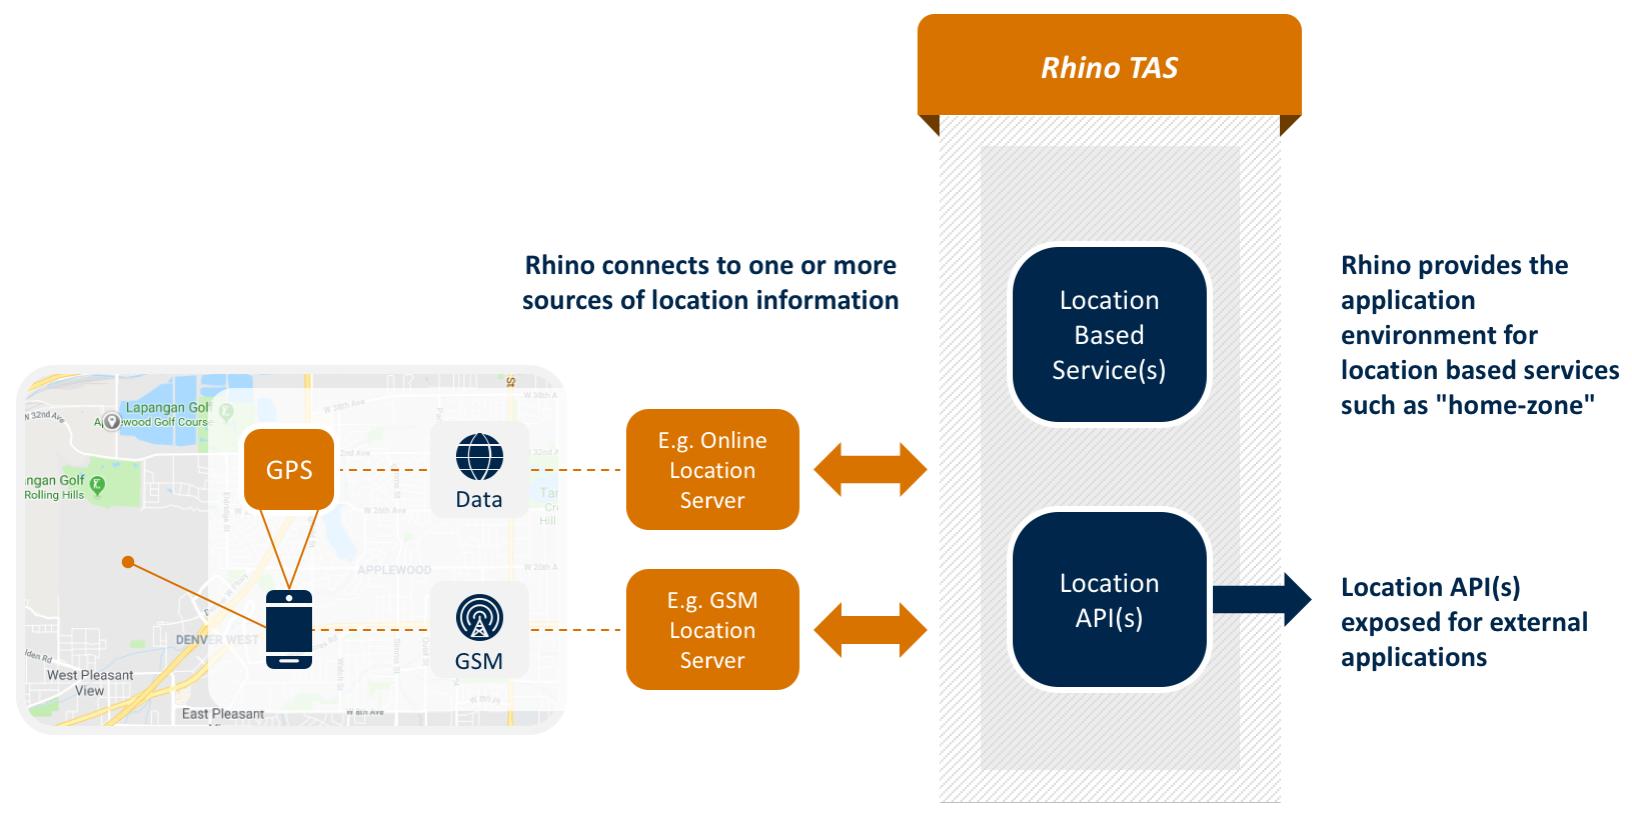 rhino-tas-app-location-based-services-platform